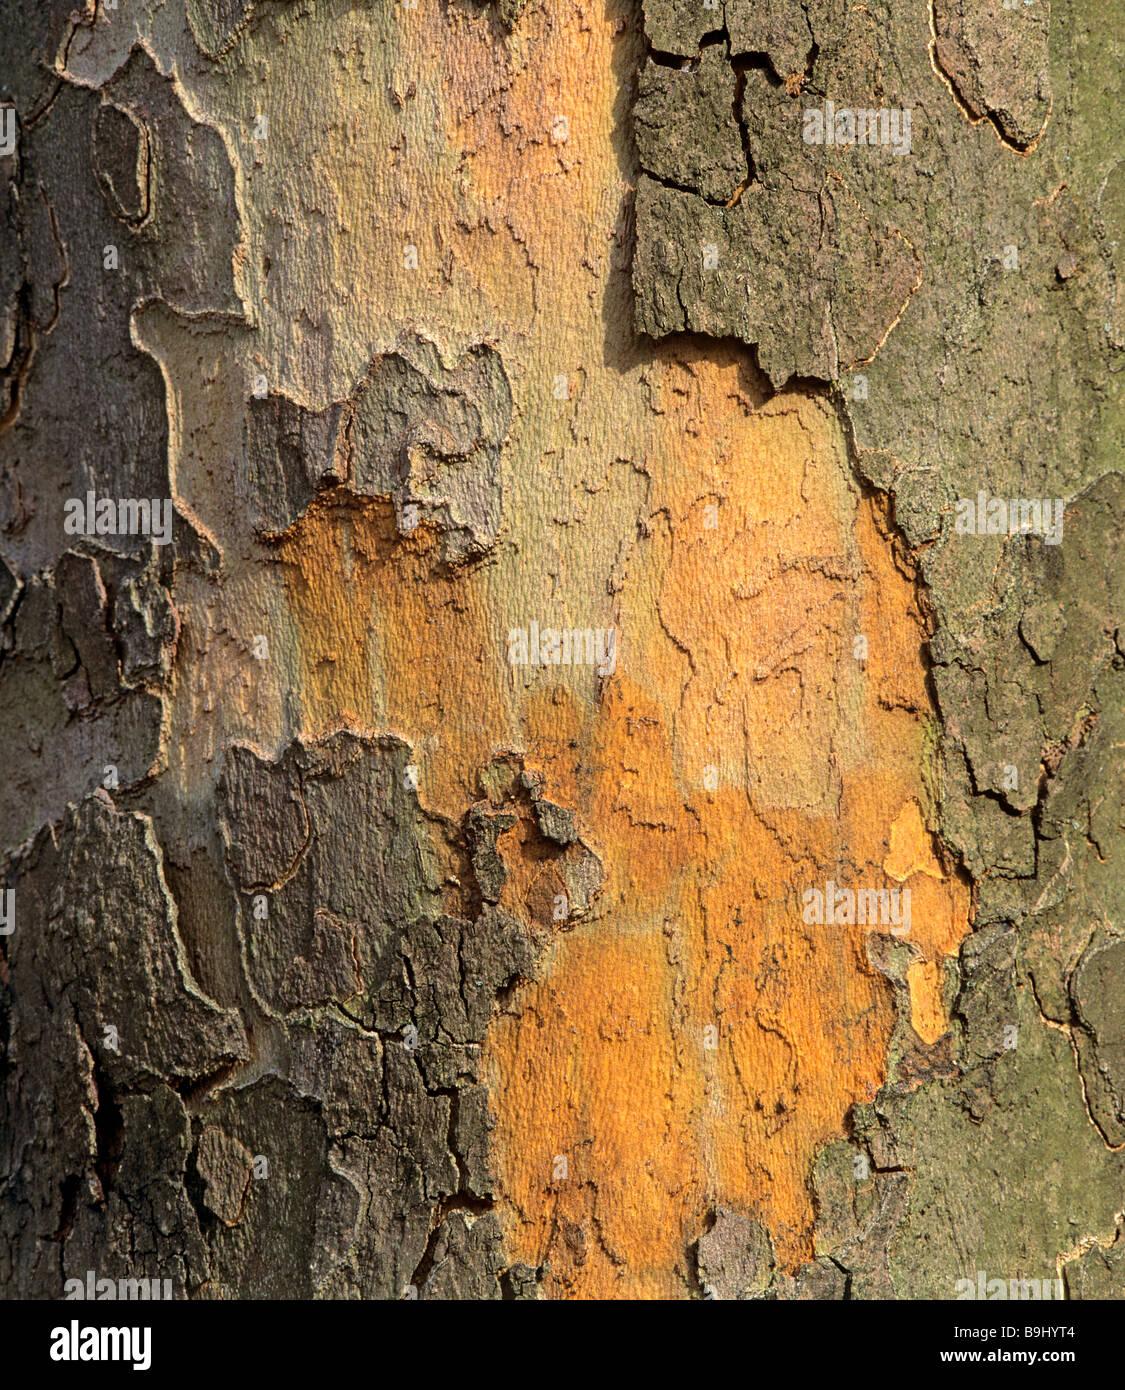 Bark of a Plane (Platanus) - Stock Image